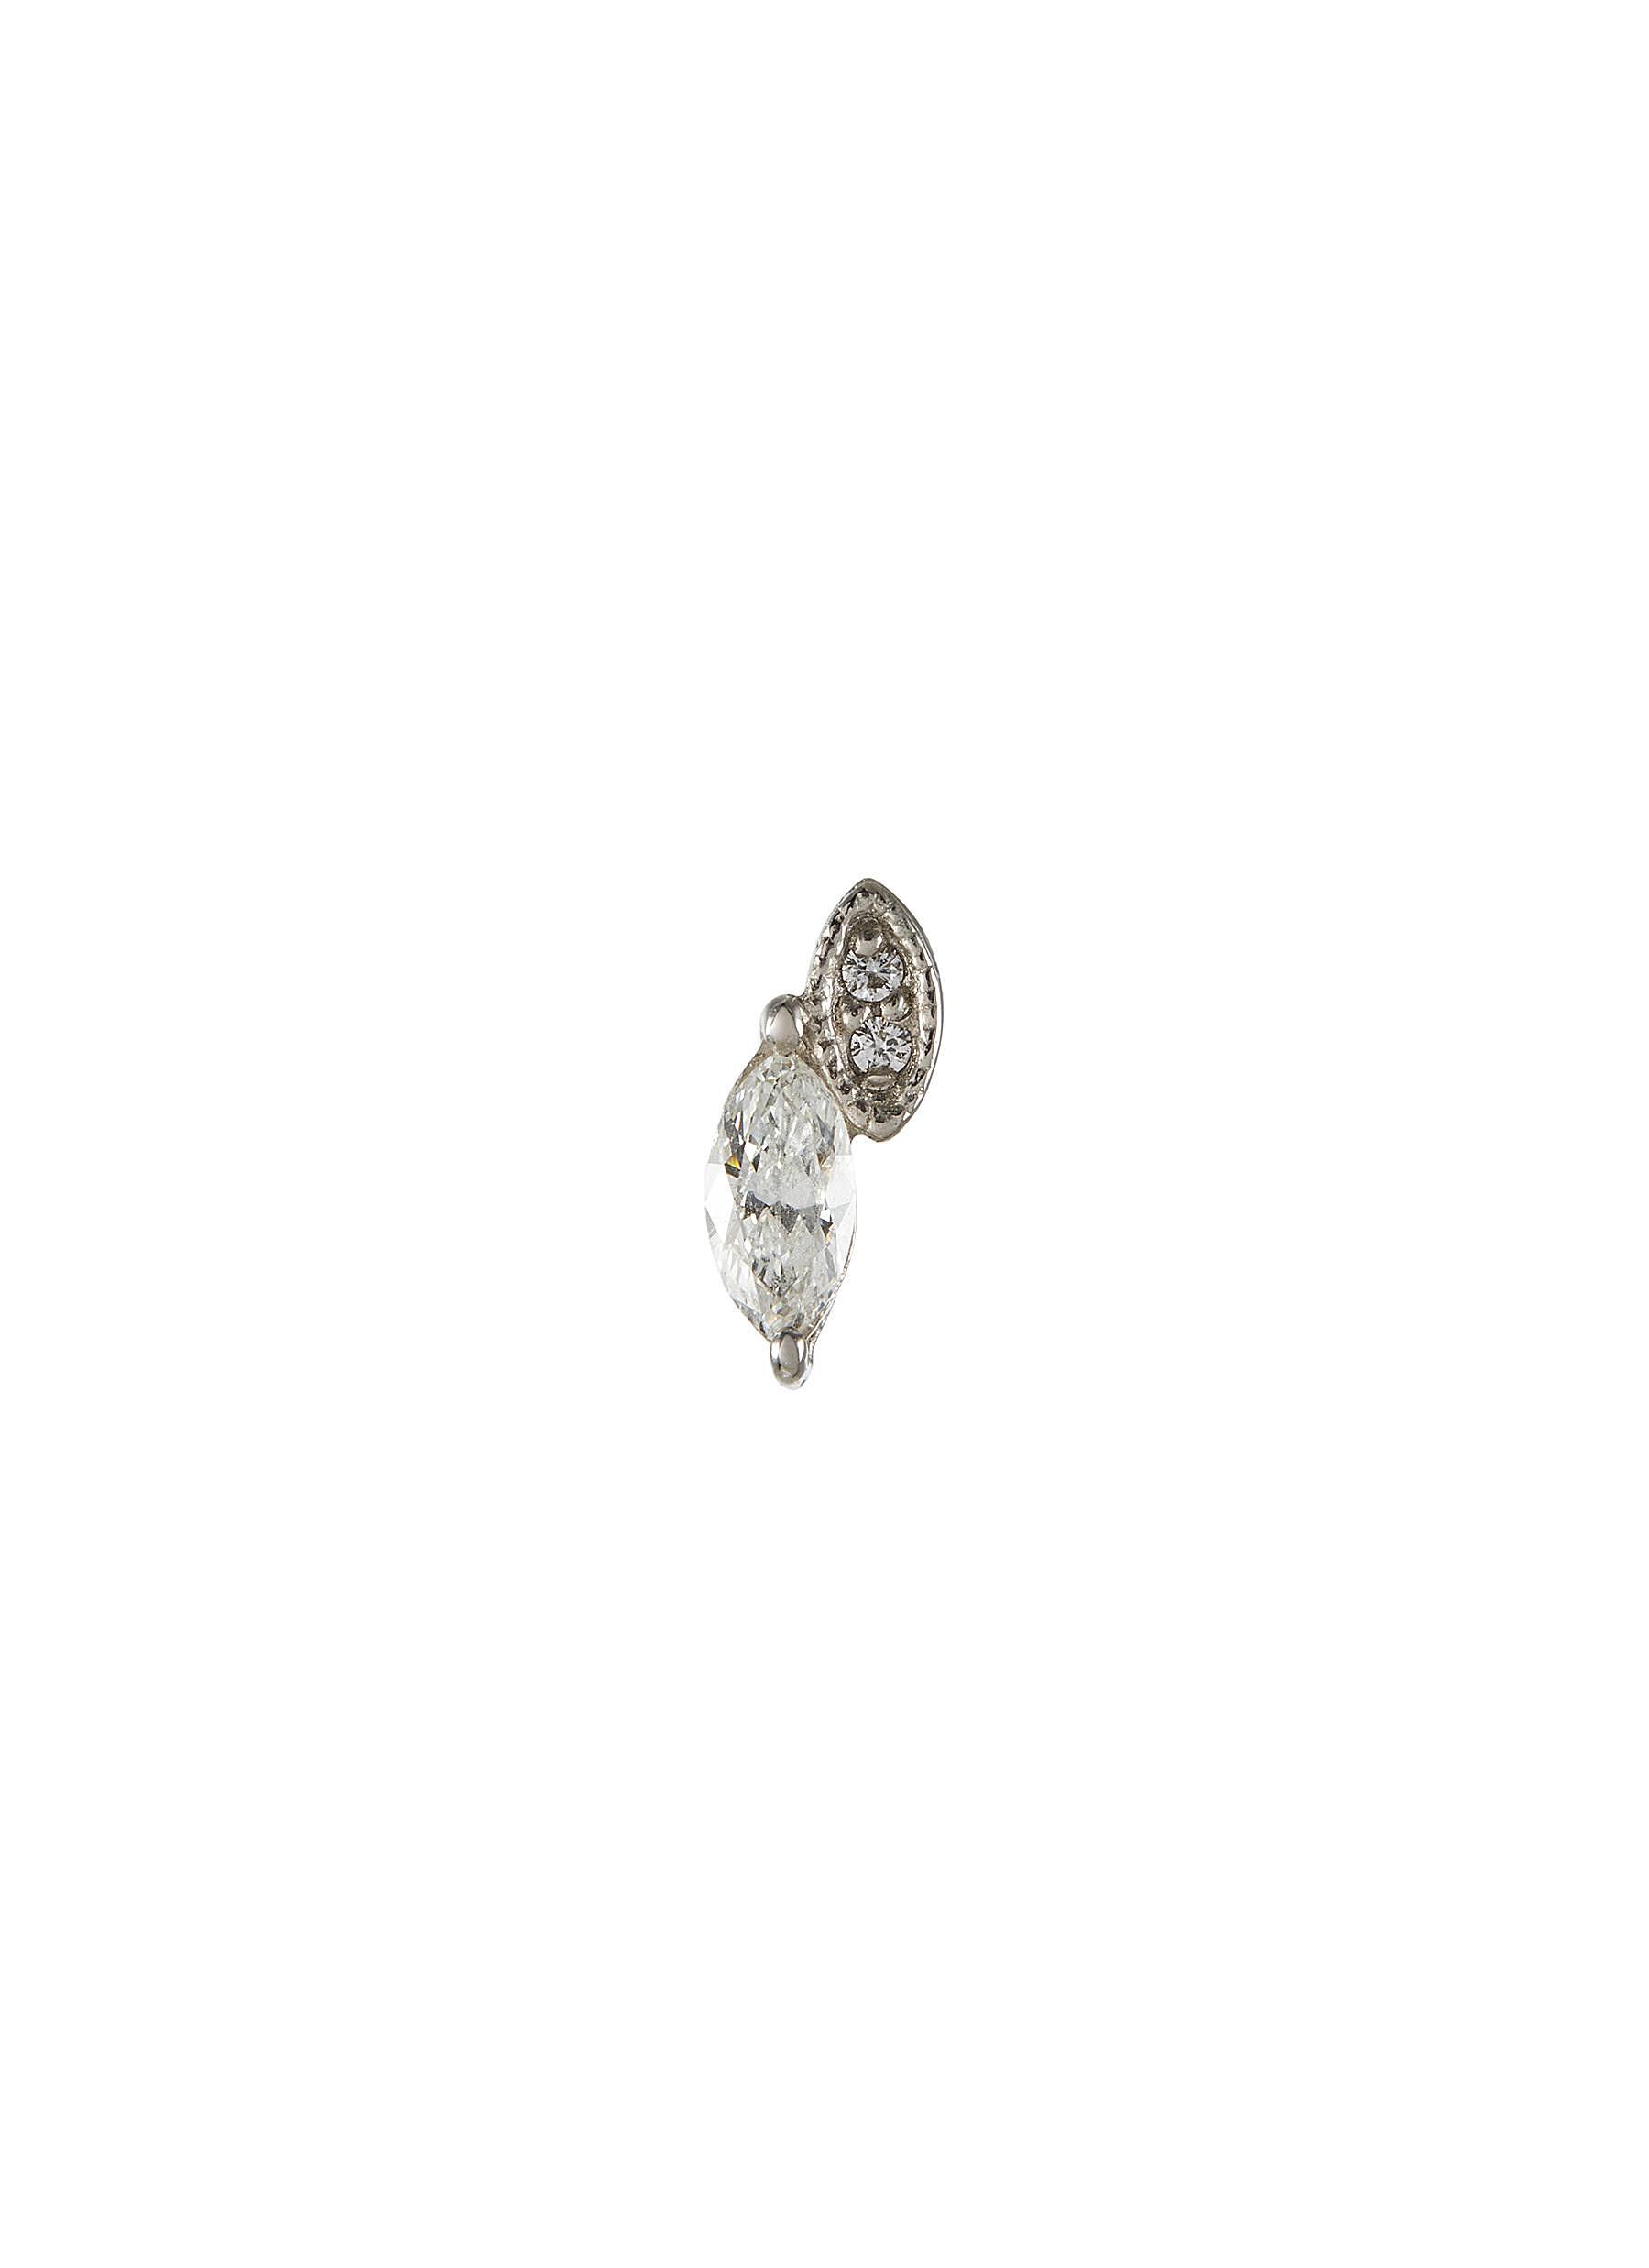 'Abelia' lab grown diamond 9k white gold stud earring